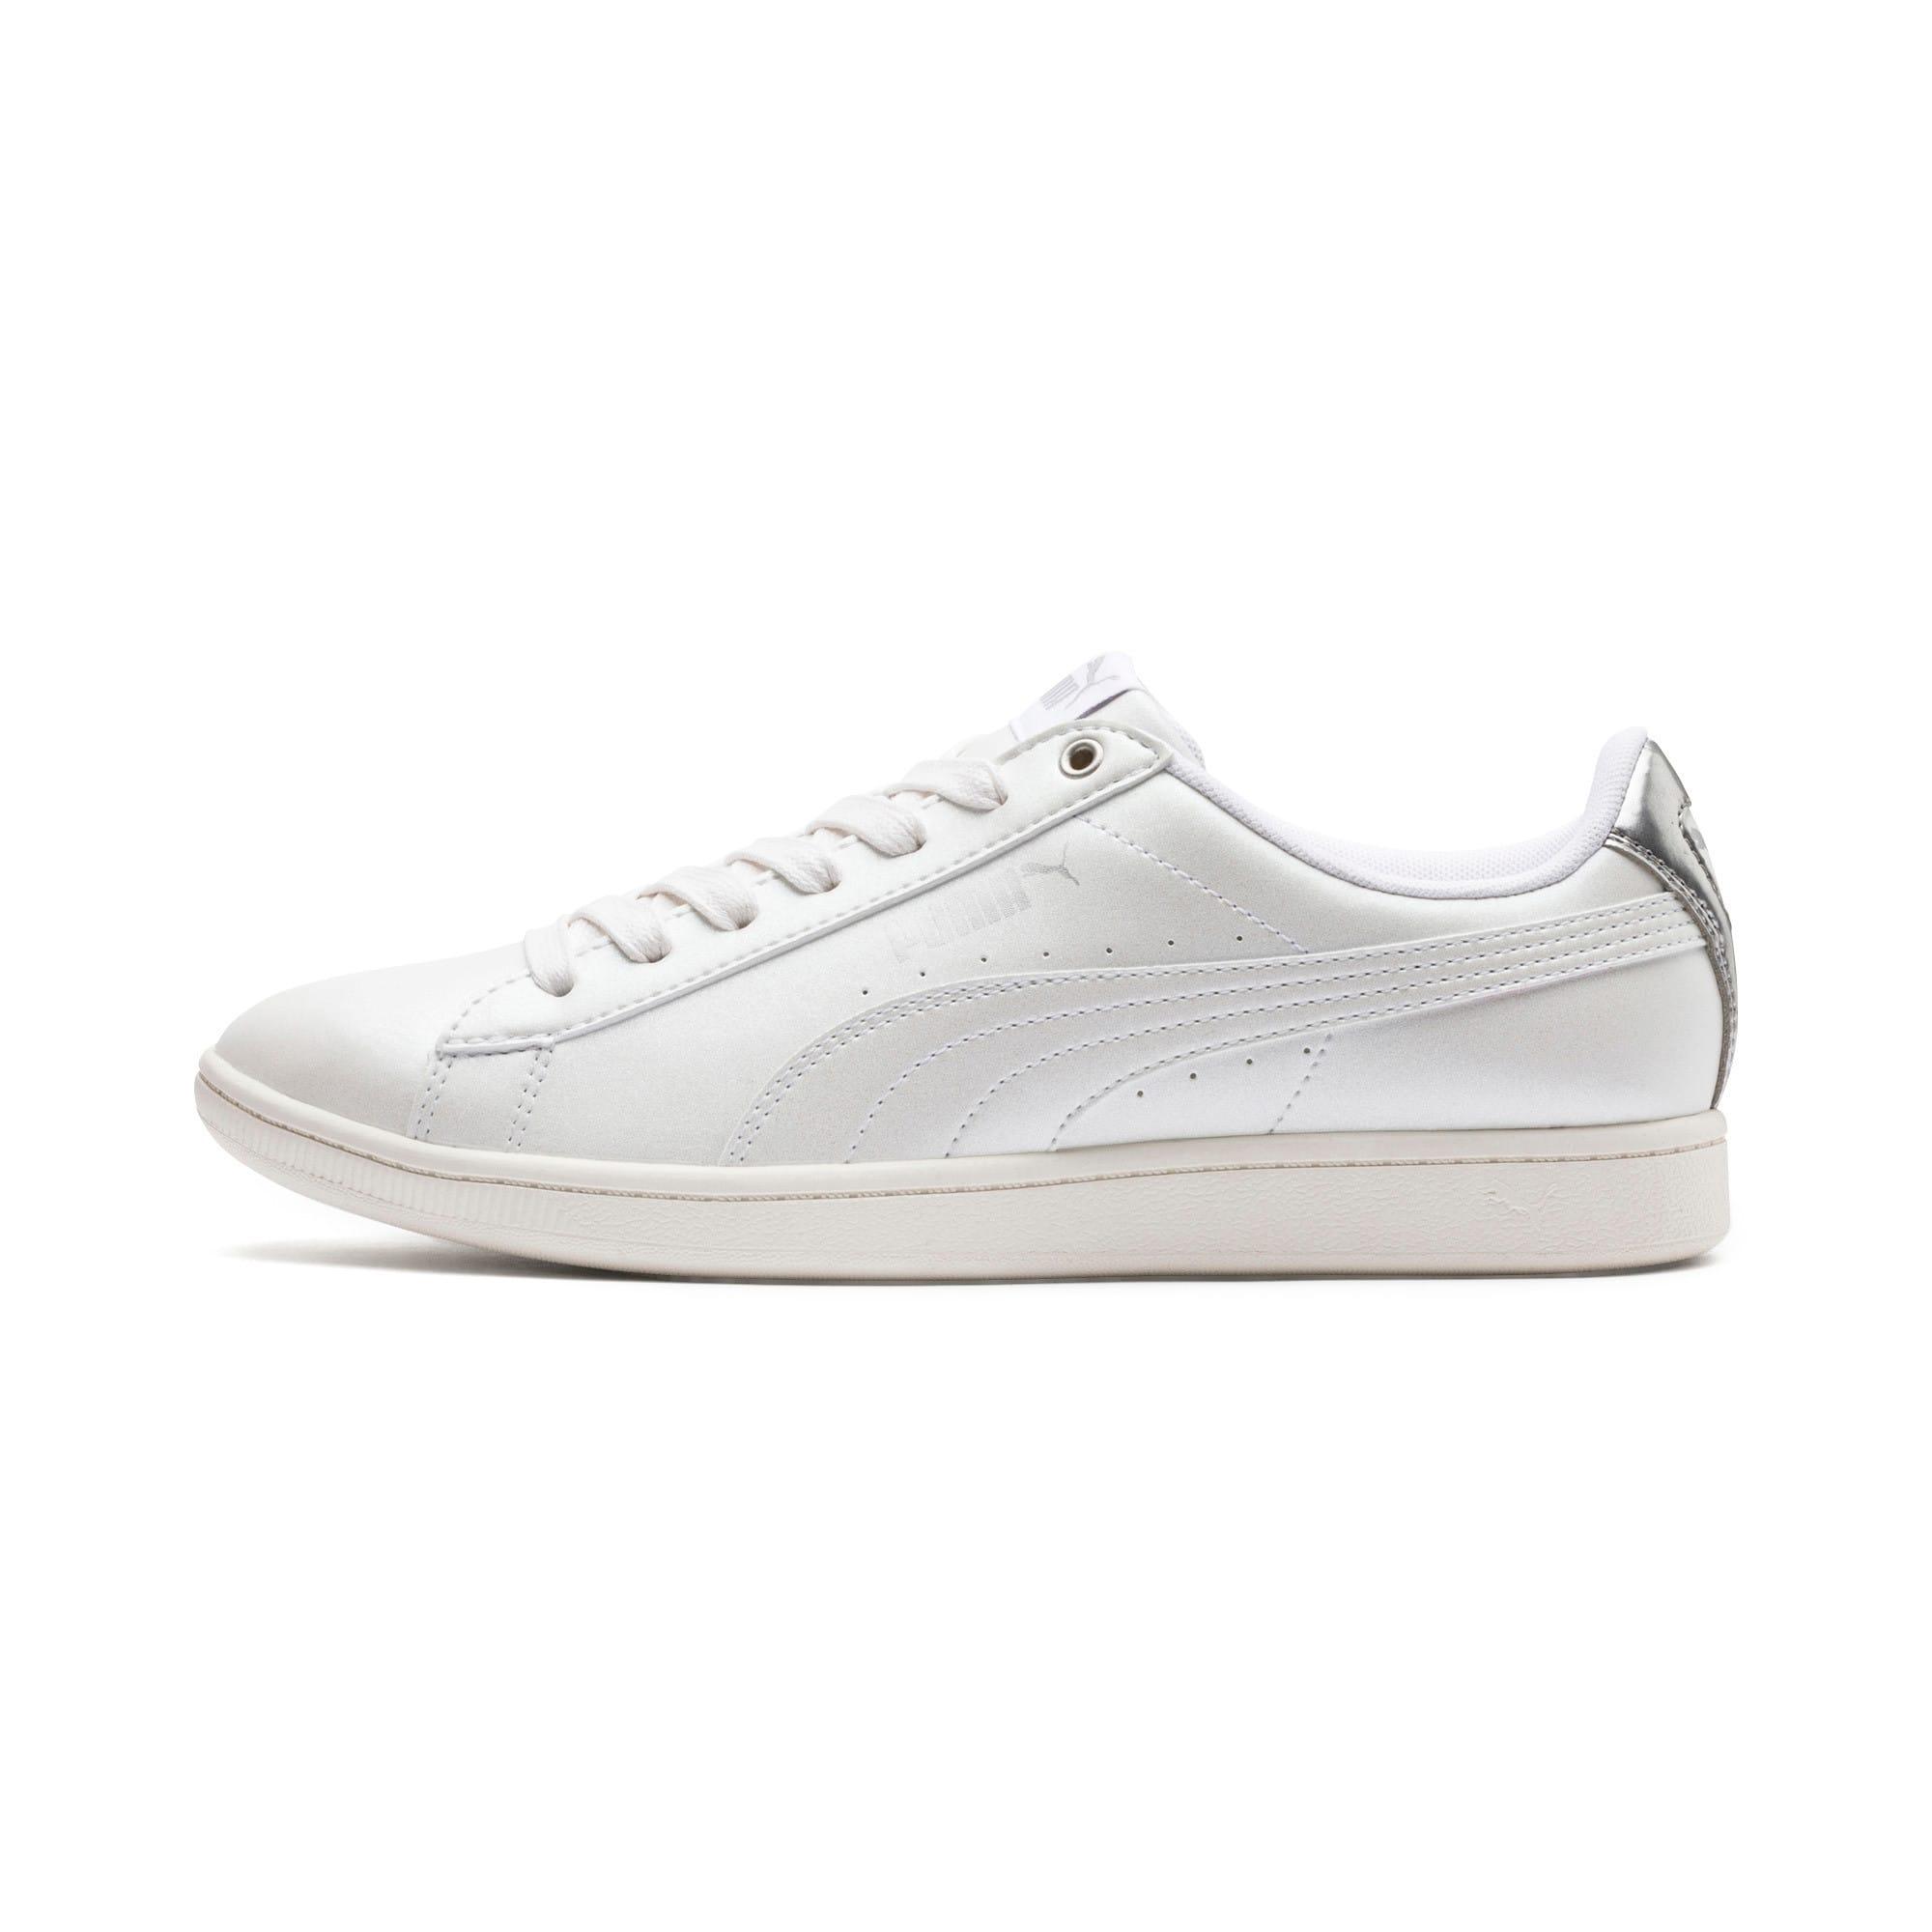 Thumbnail 1 of Puma Vikky LX Sneakers, Puma White-White-Whisper, medium